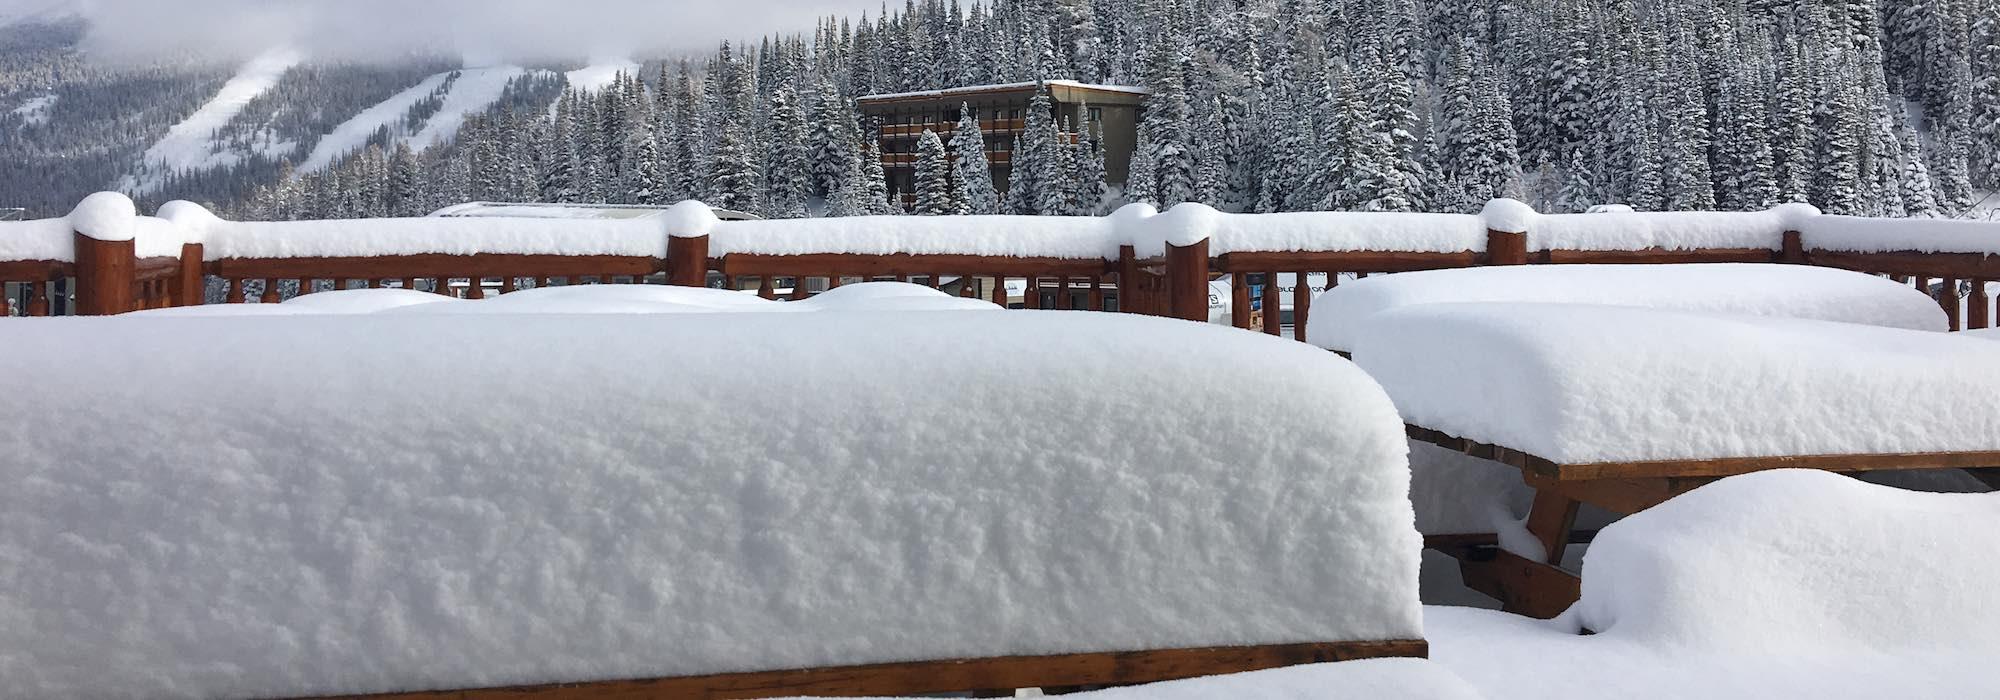 Snow conditions at Banff Sunshine Village on November 16, 2018.